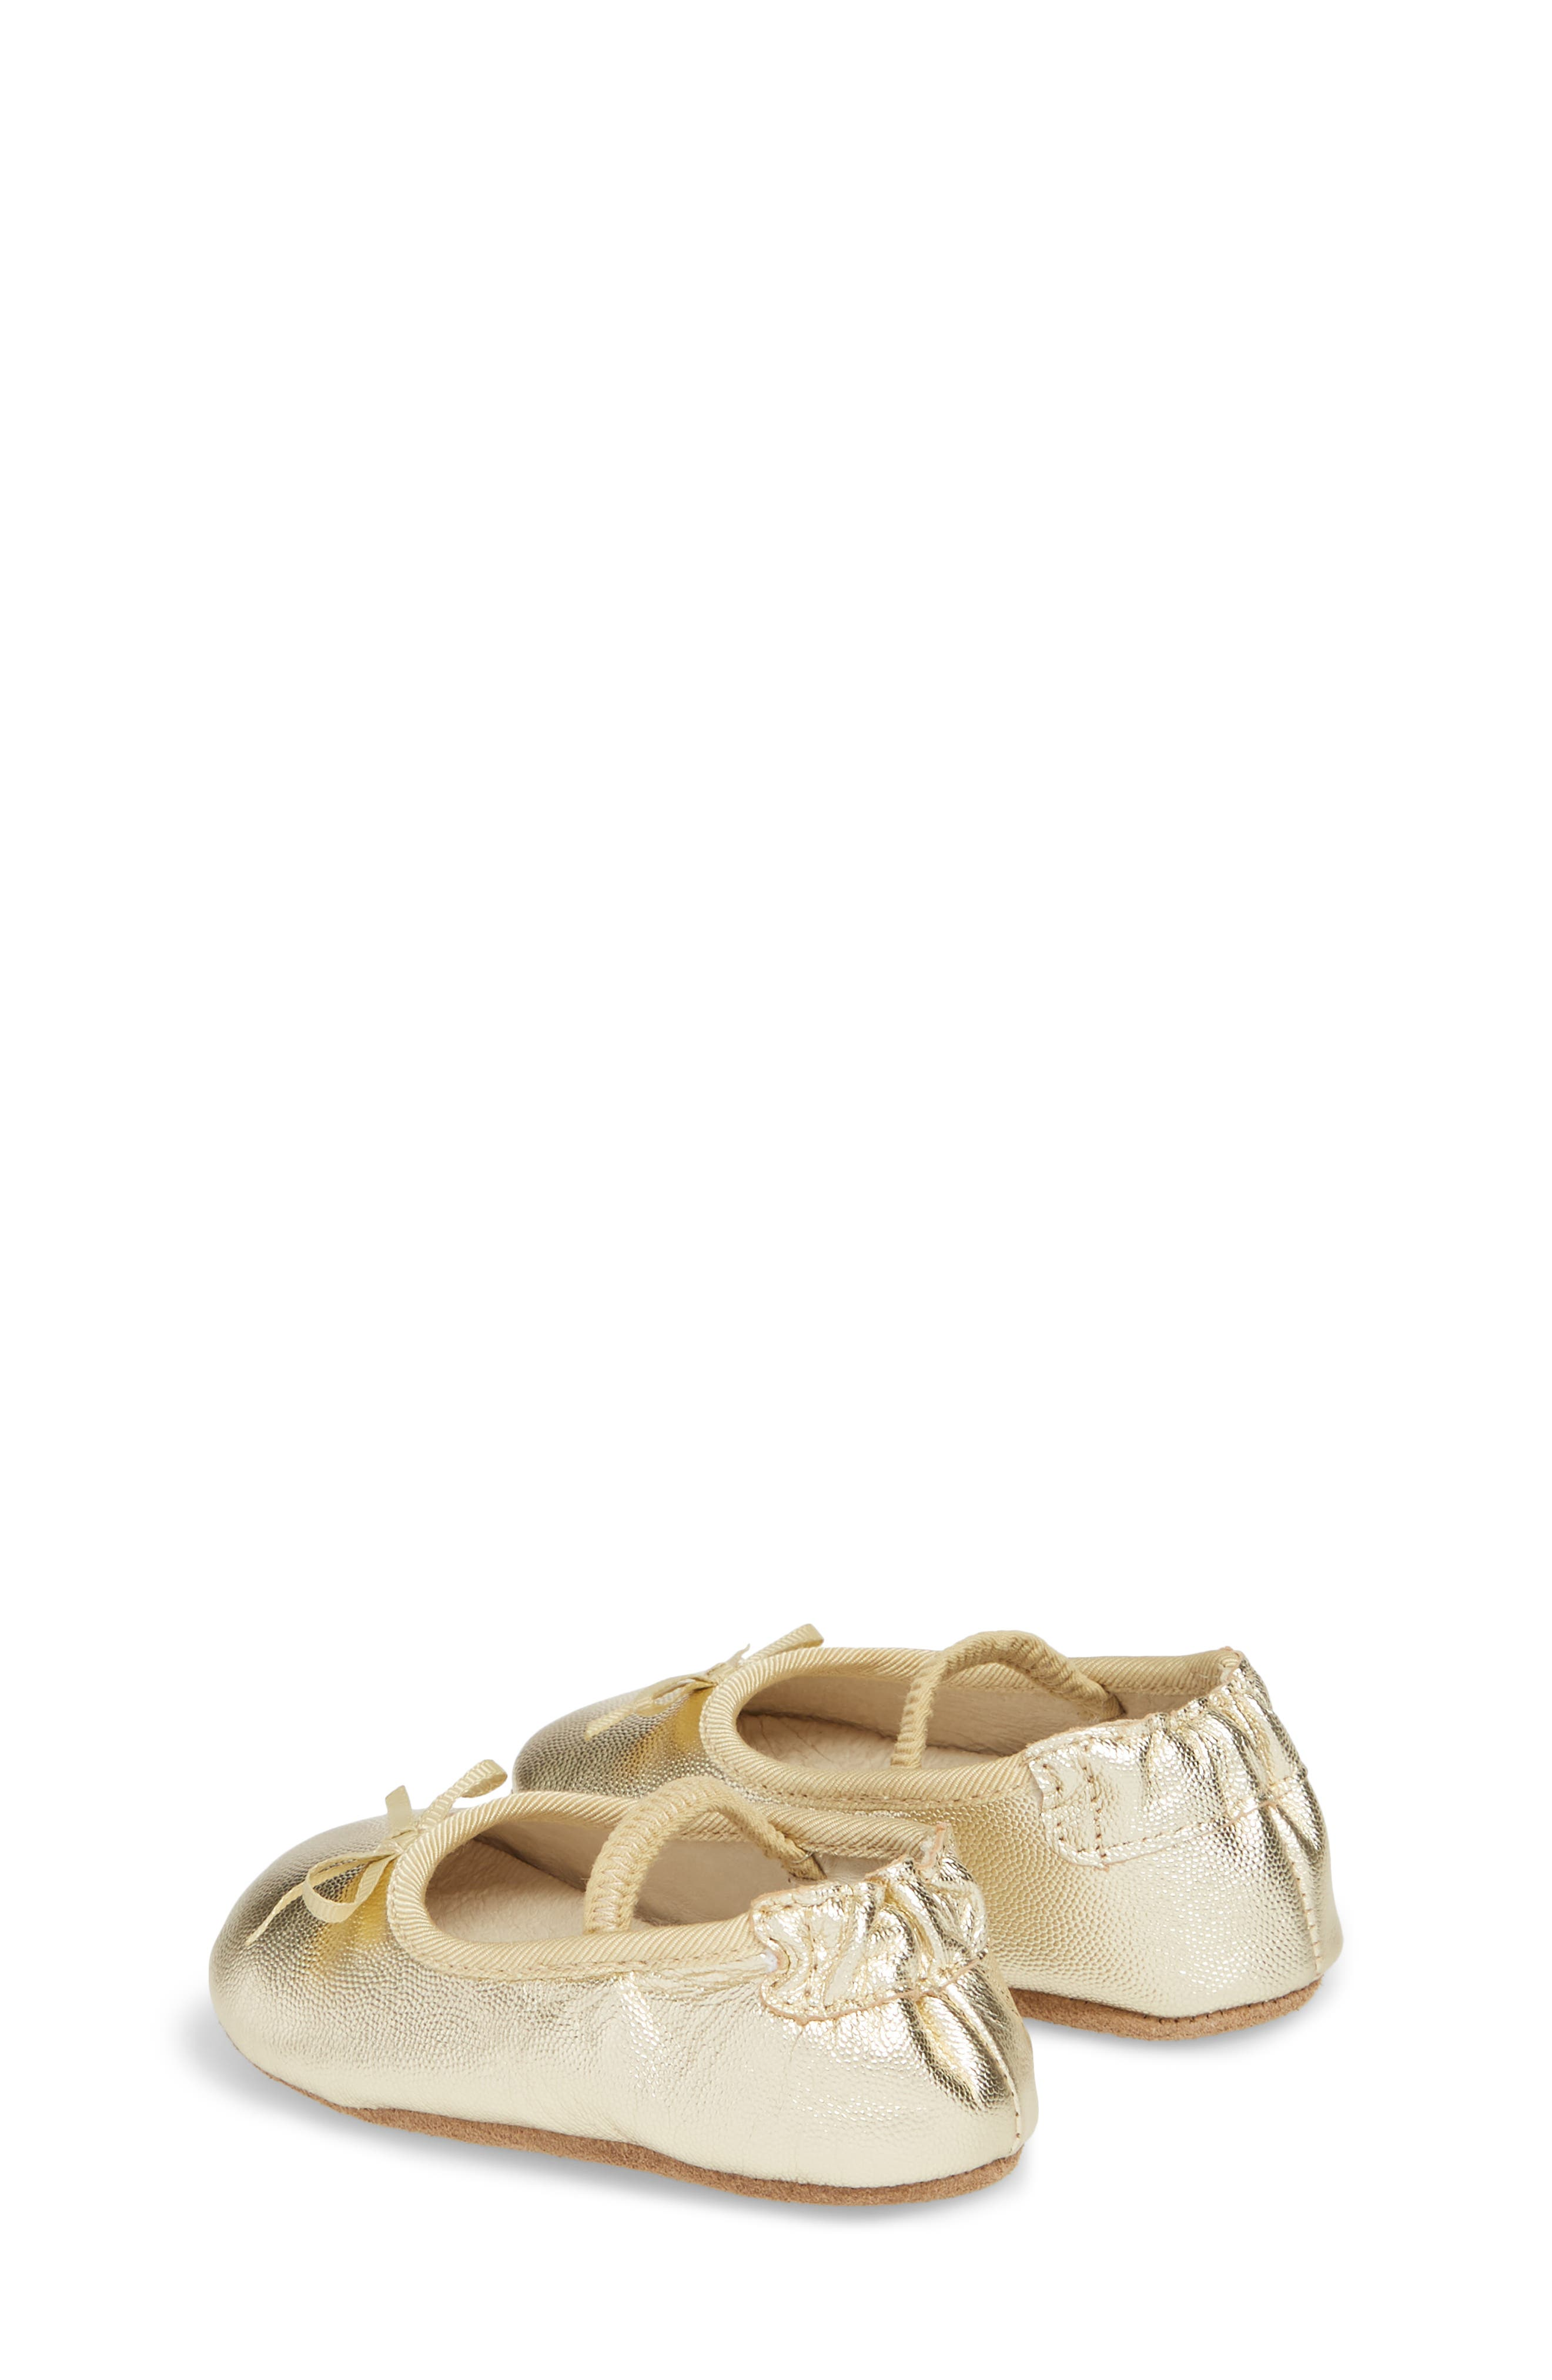 ROBEEZ<SUP>®</SUP>, Athena Ballet Strap Crib Shoe, Alternate thumbnail 2, color, GOLD